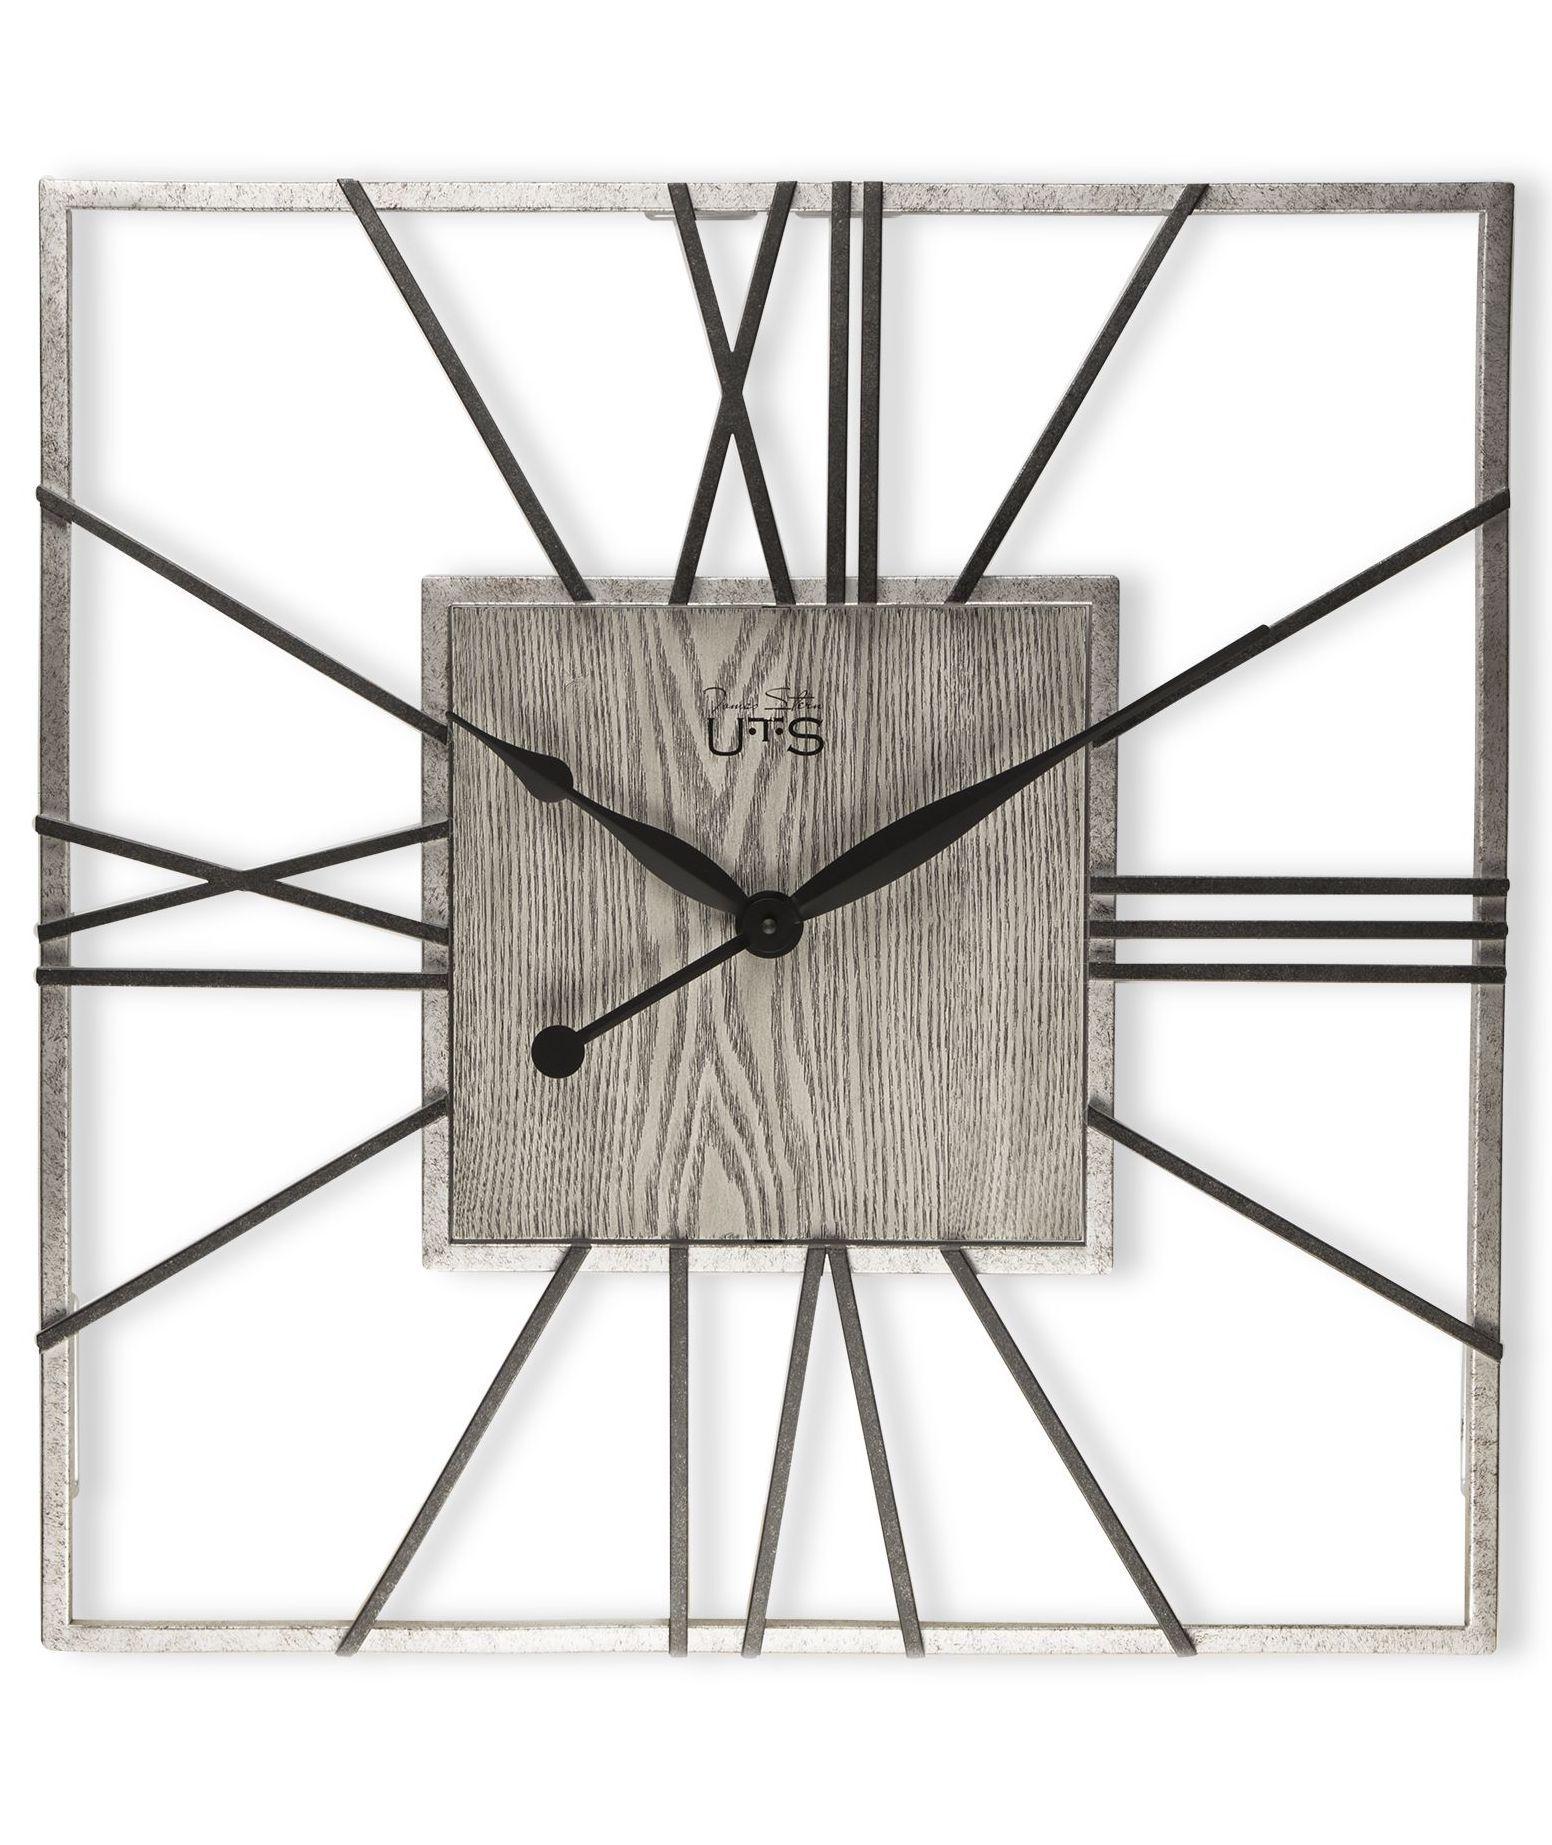 Часы настенные Часы настенные Tomas Stern 9003 chasy-nastennye-tomas-stern-9003-germaniya.jpg